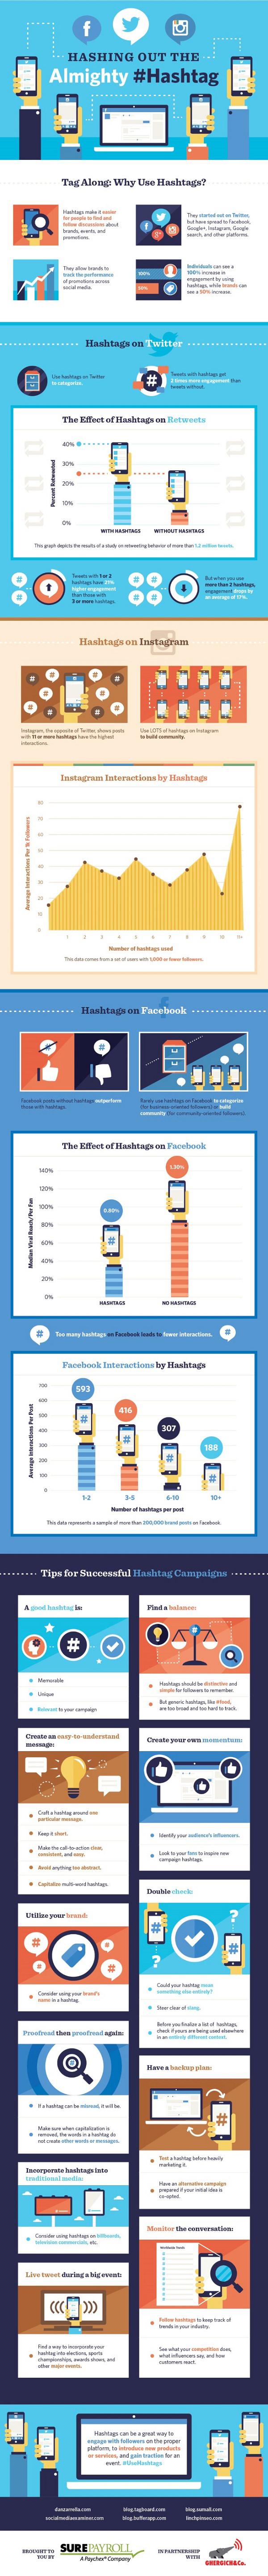 infografia-hashtags